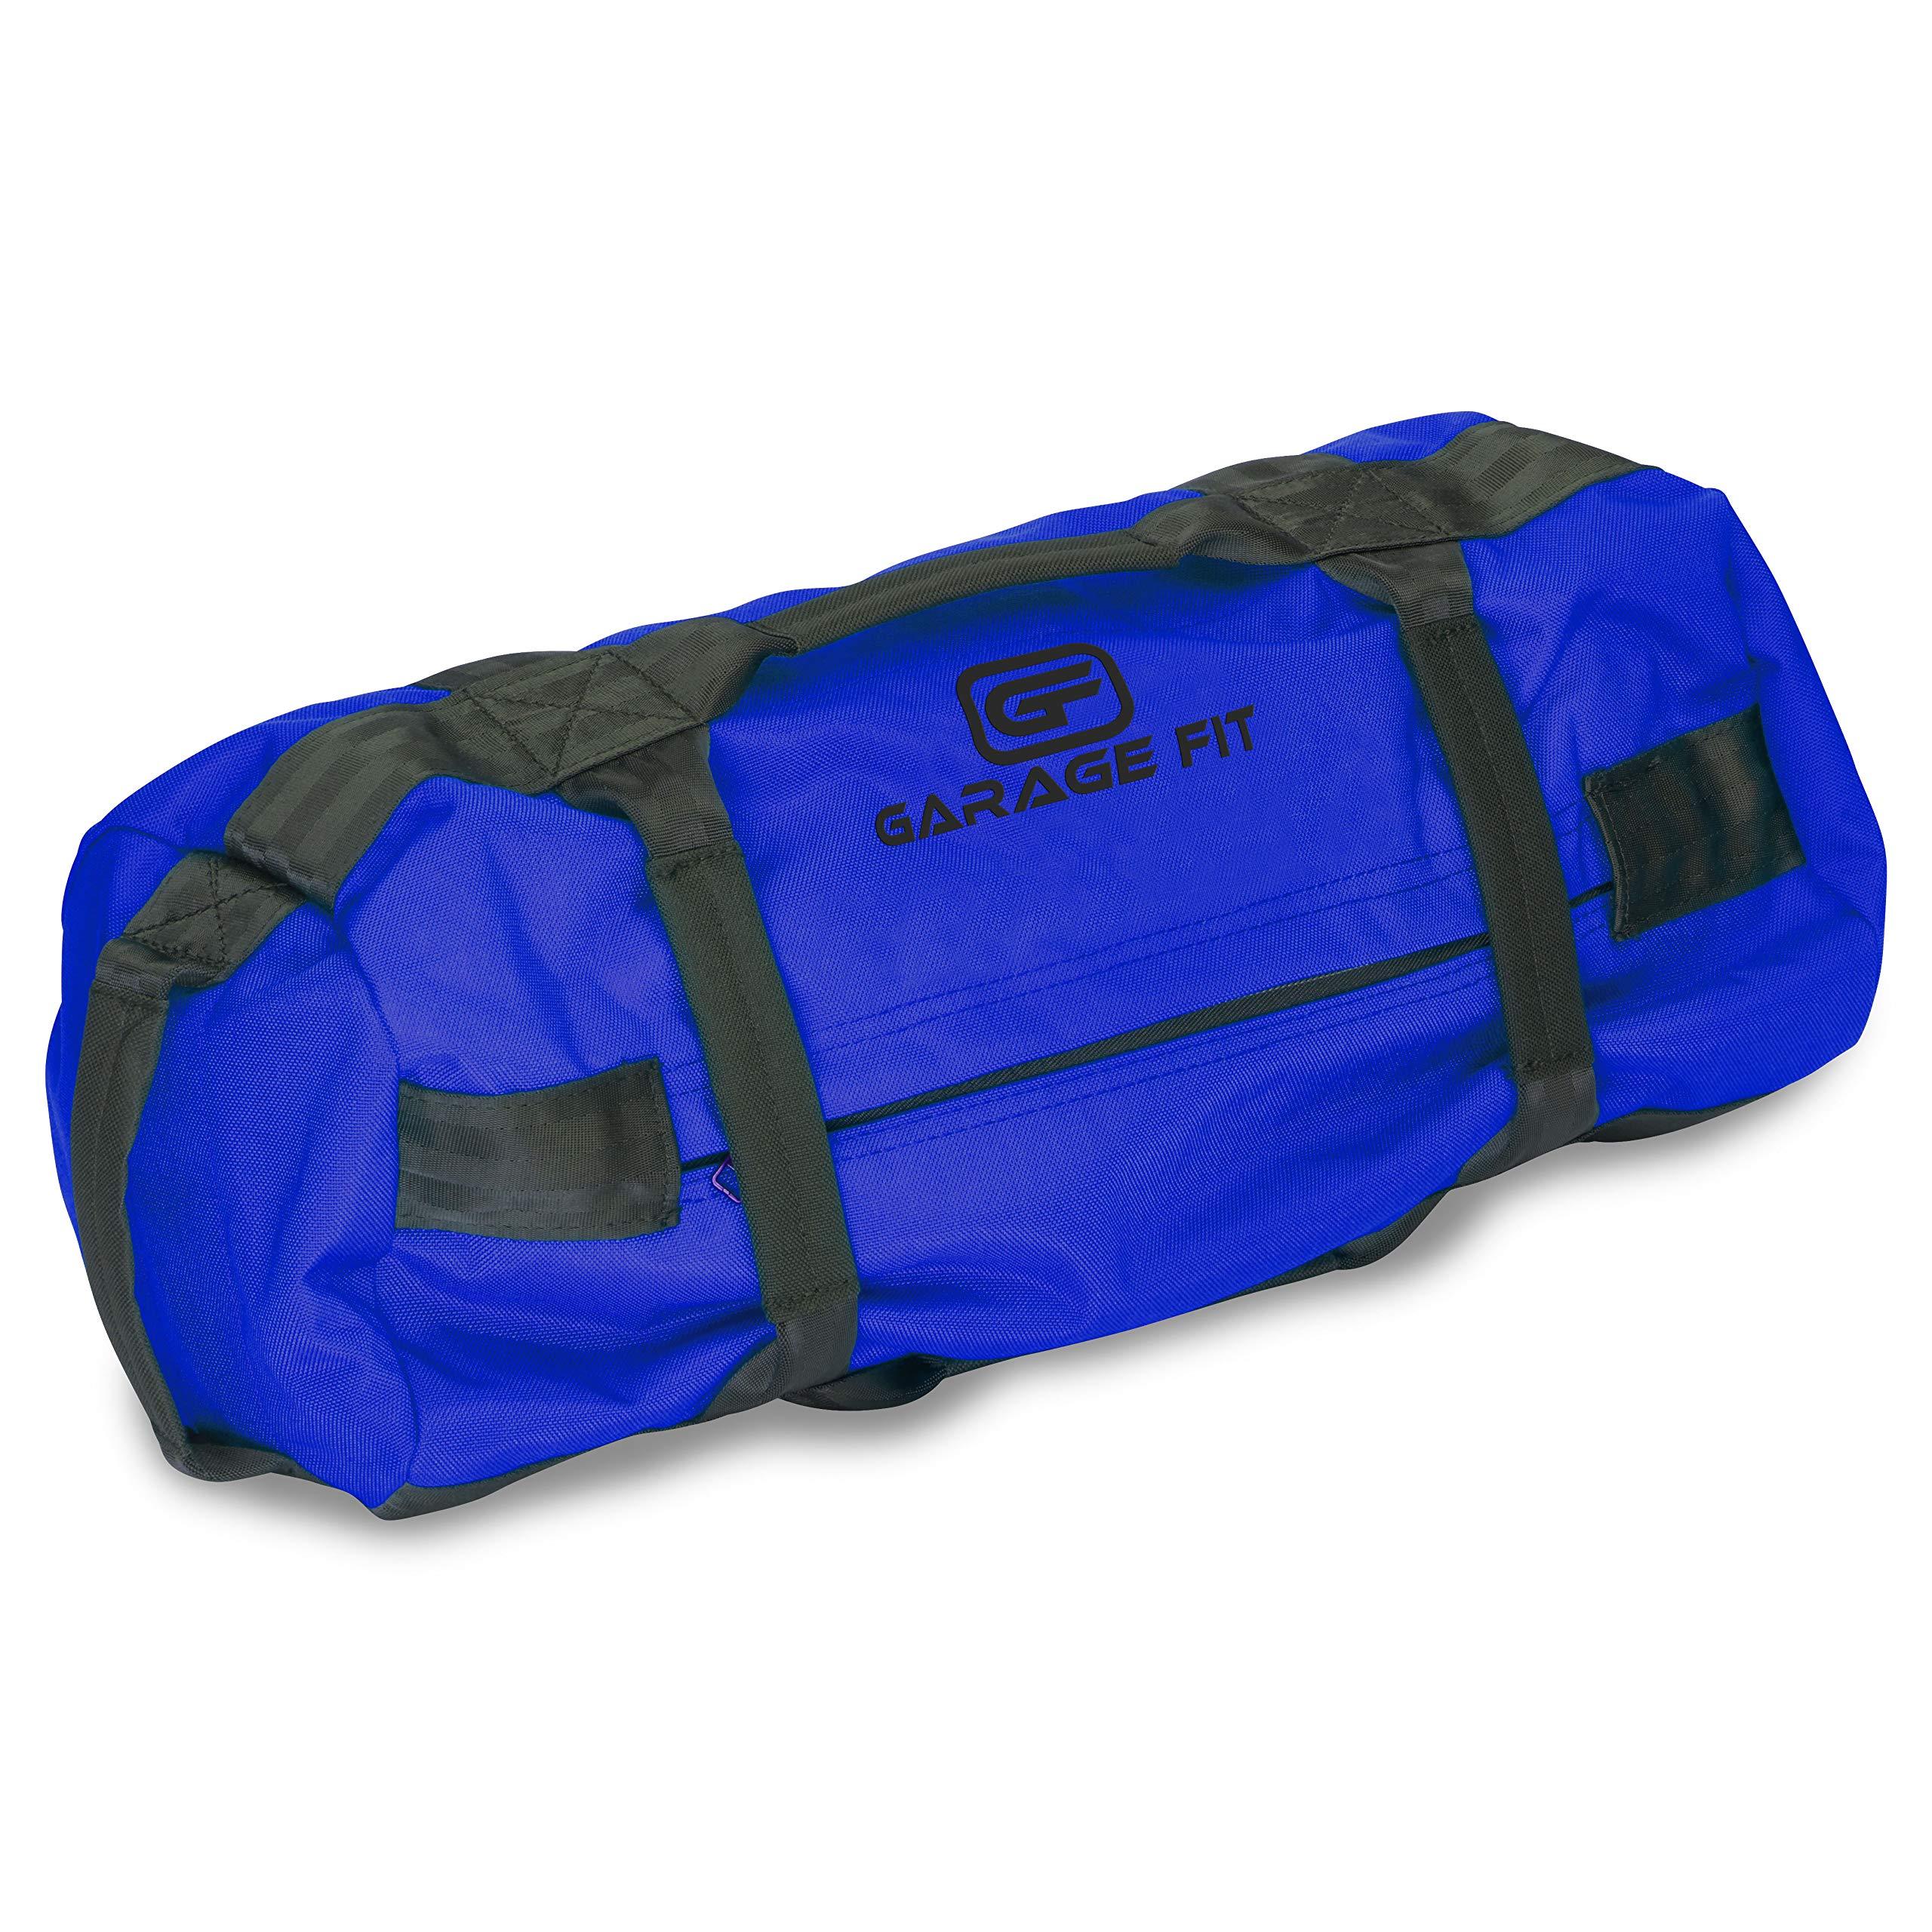 Garage Fit Heavy Duty Workout Sandbags with Fabric Handle for Fitness, Exercise Sandbags, Military Sandbags, Weighted Bags, Heavy Sand Bags, Weighted Sandbag, Fitness Sandbags